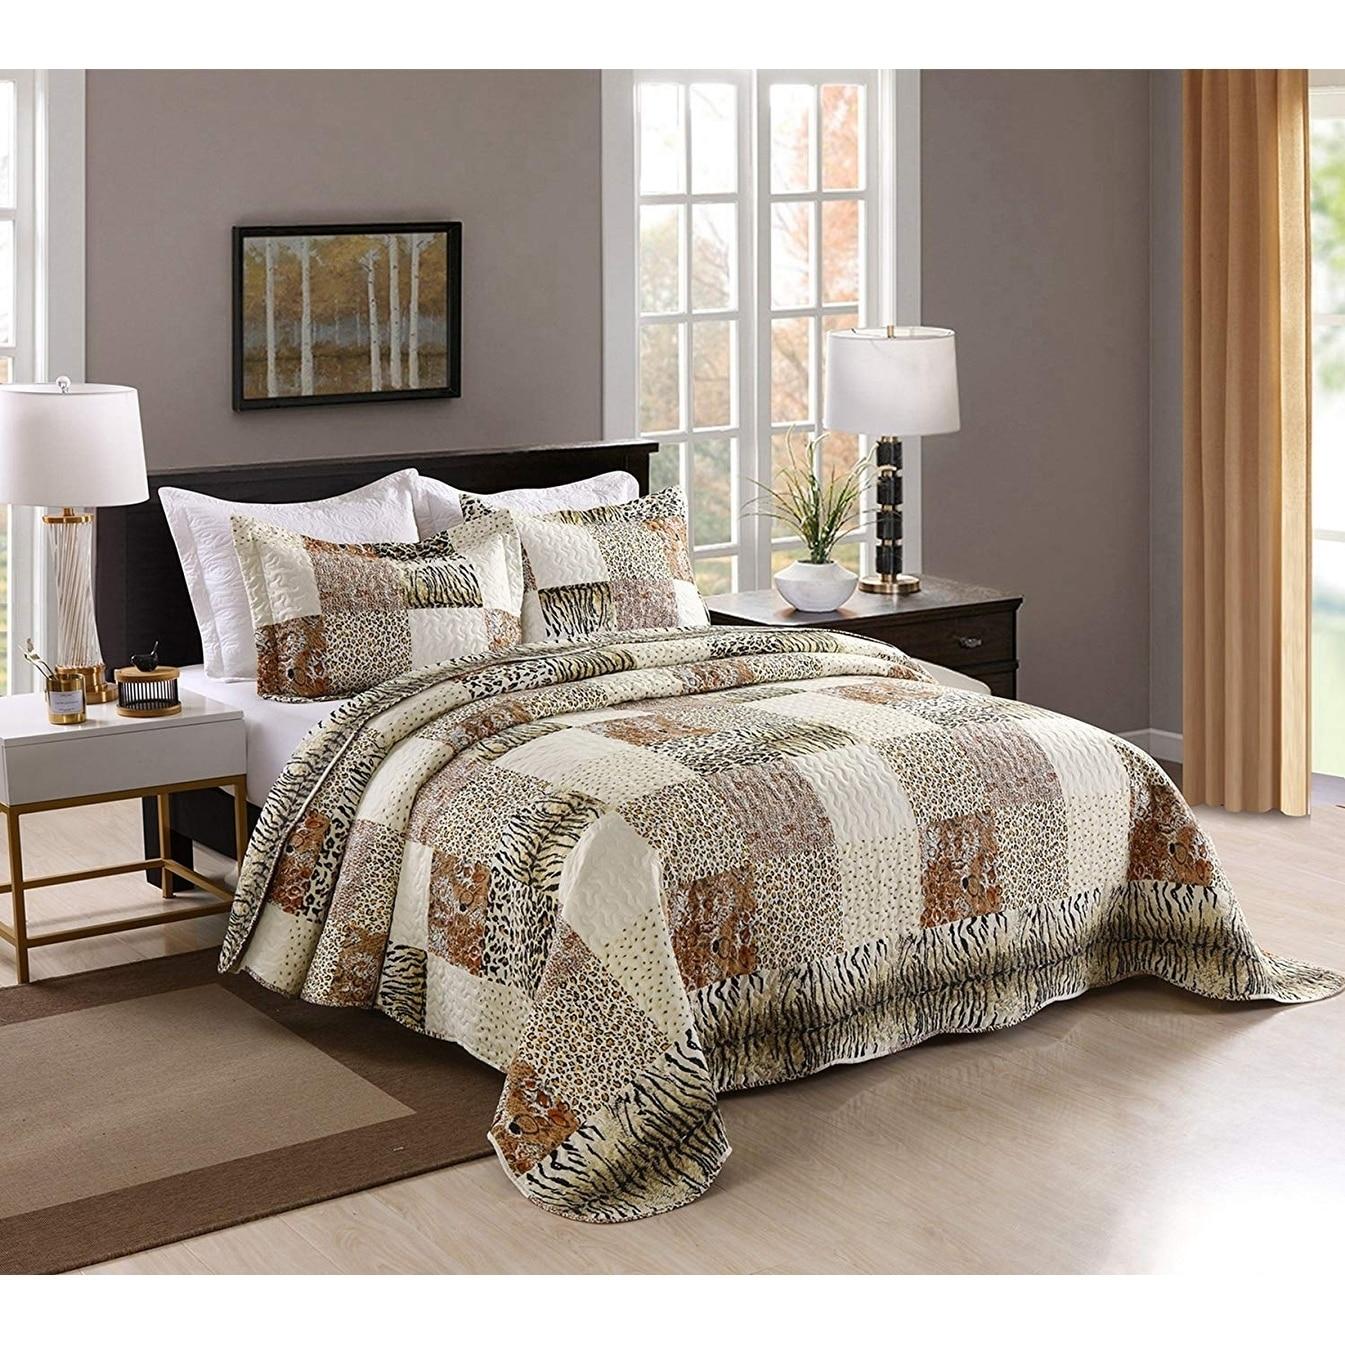 King Size Pillow Sham Jacquard Pattern 20X36+2-Leopard Collection